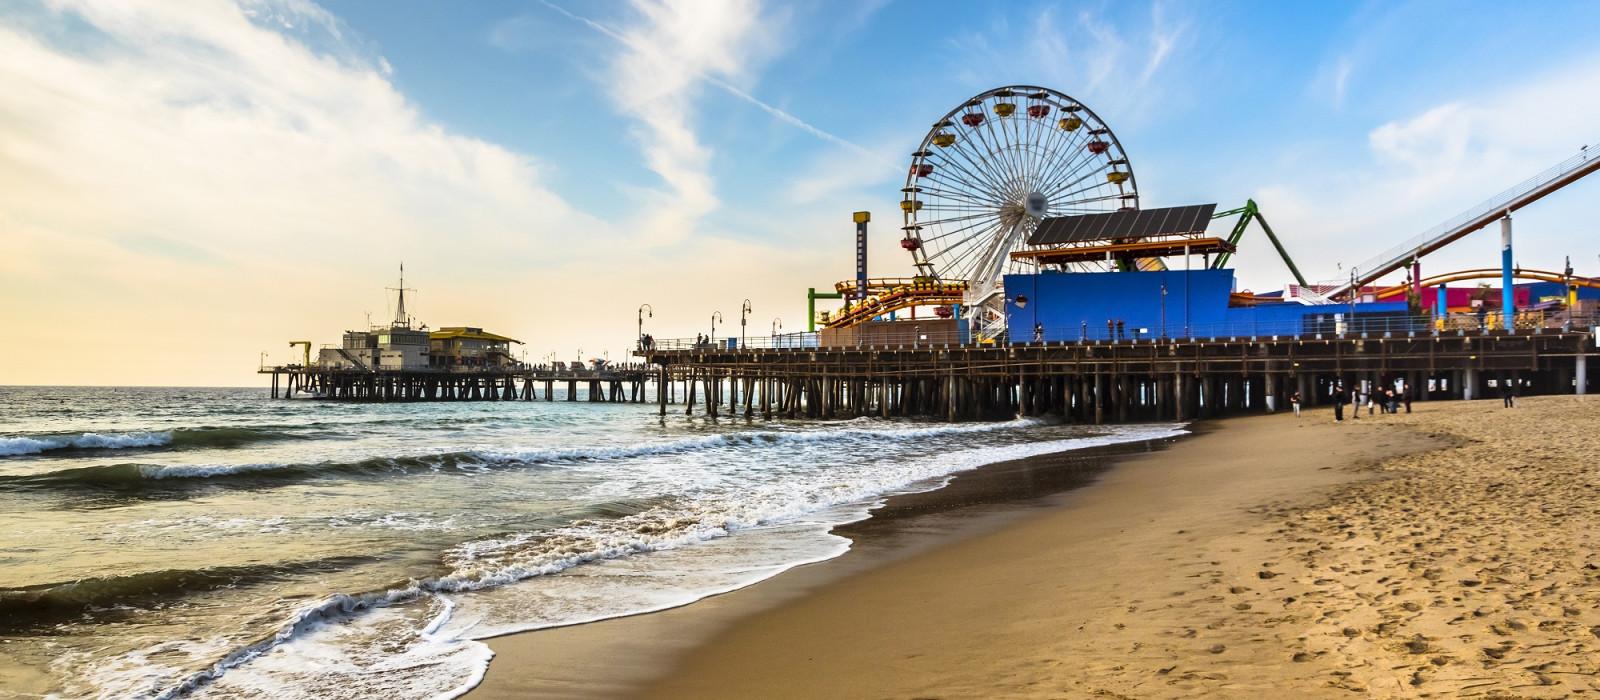 Destination Santa Monica USA